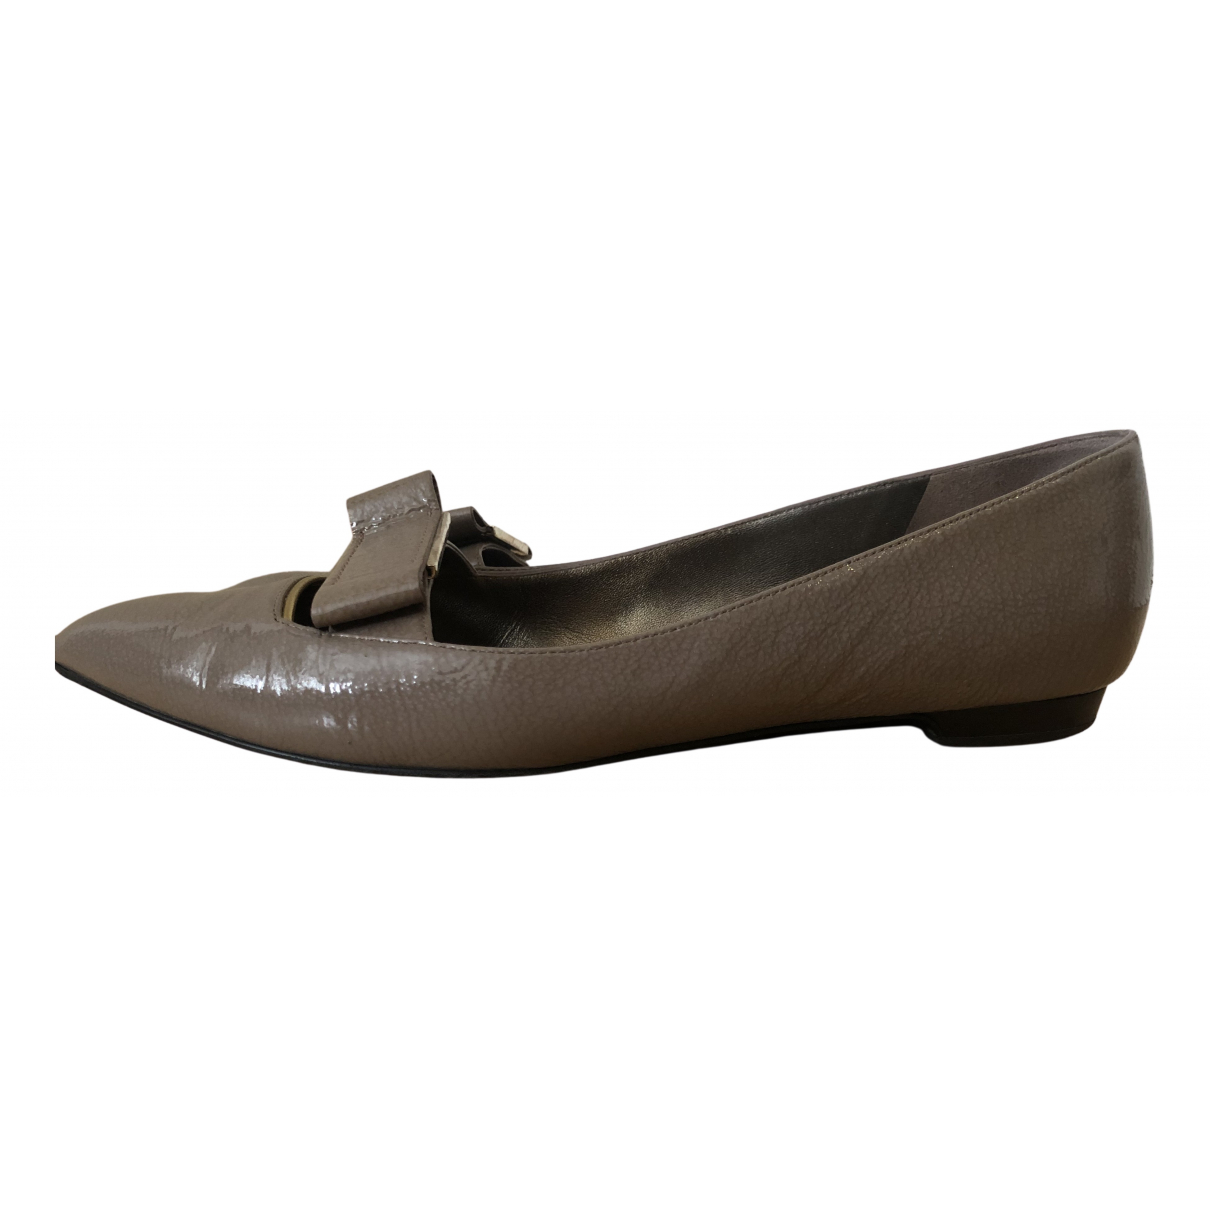 Lanvin N Grey Patent leather Flats for Women 41 EU